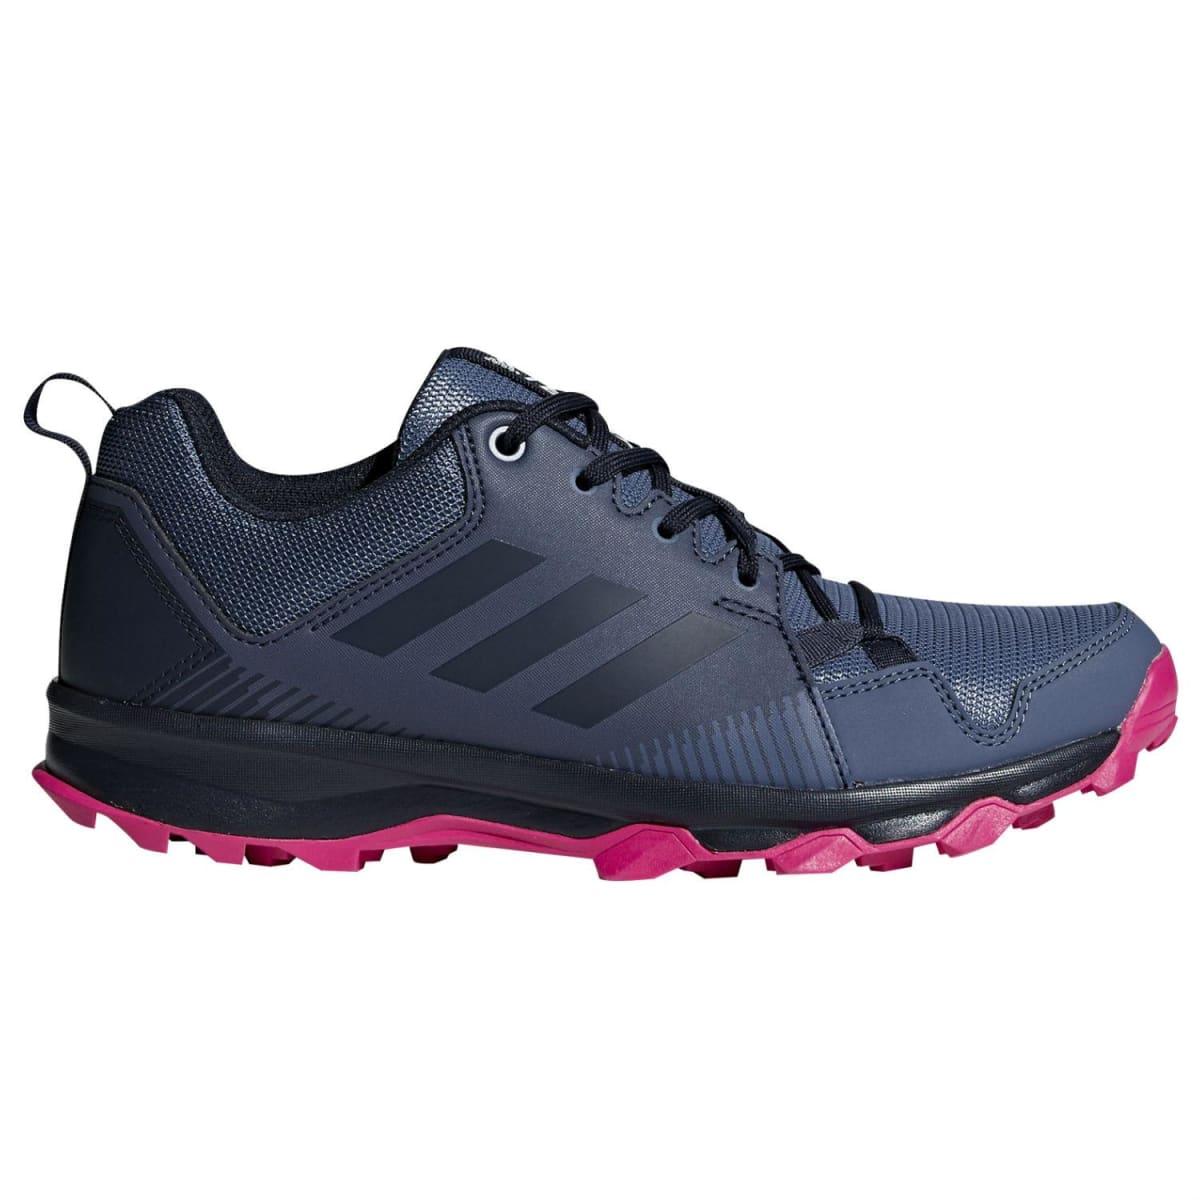 525ad2bf8ea Women | Hiking | Sportsmans Warehouse